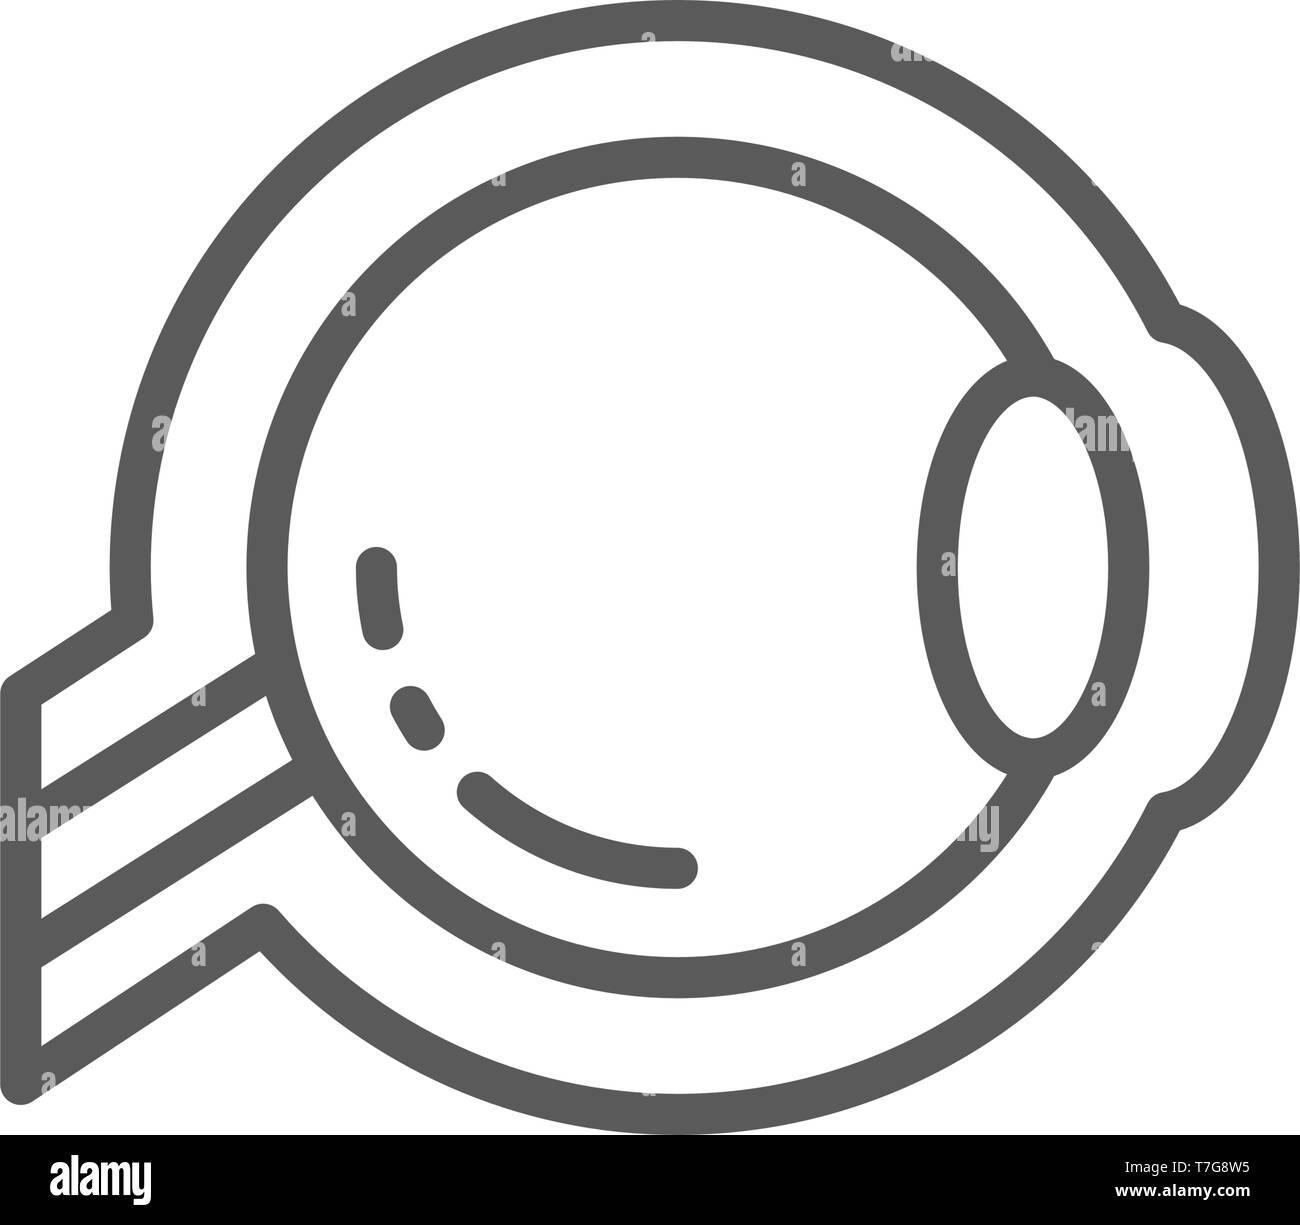 Eyeball, optic nerve line icon. - Stock Image